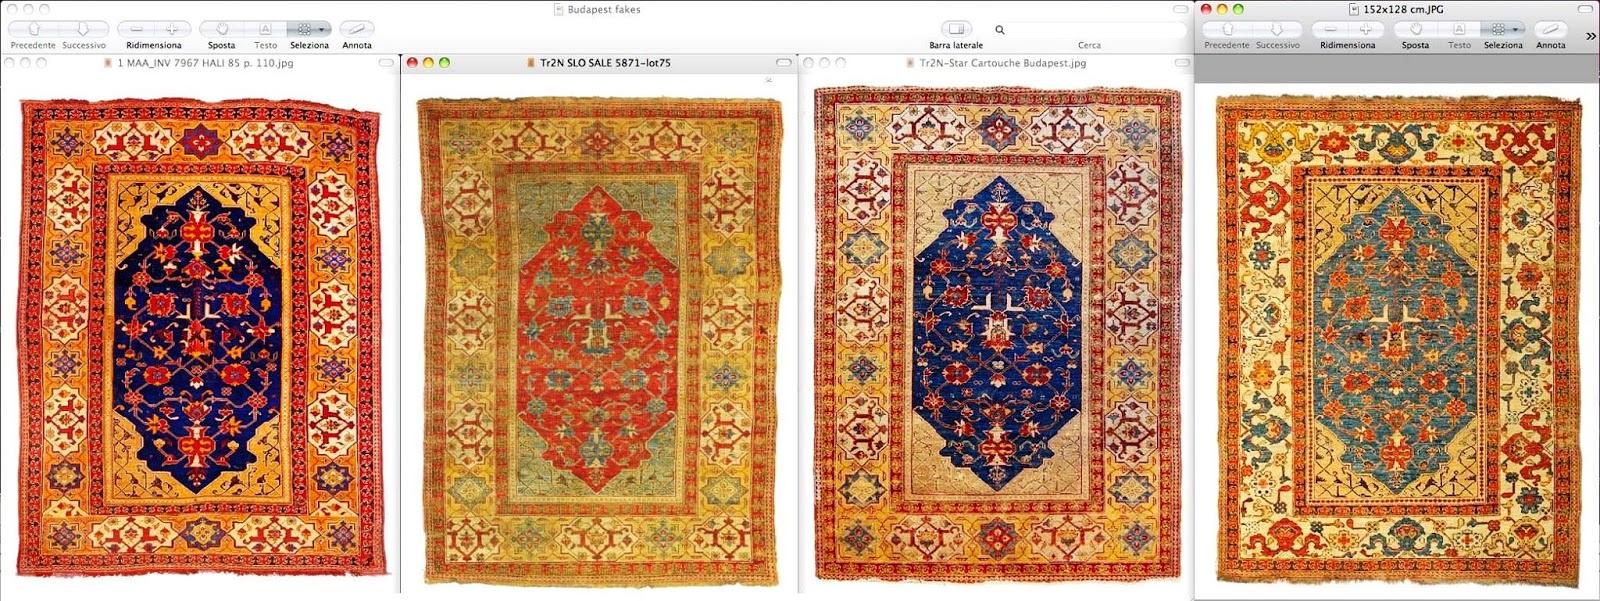 Antique Oushak Transylvanian rug 17th century 2